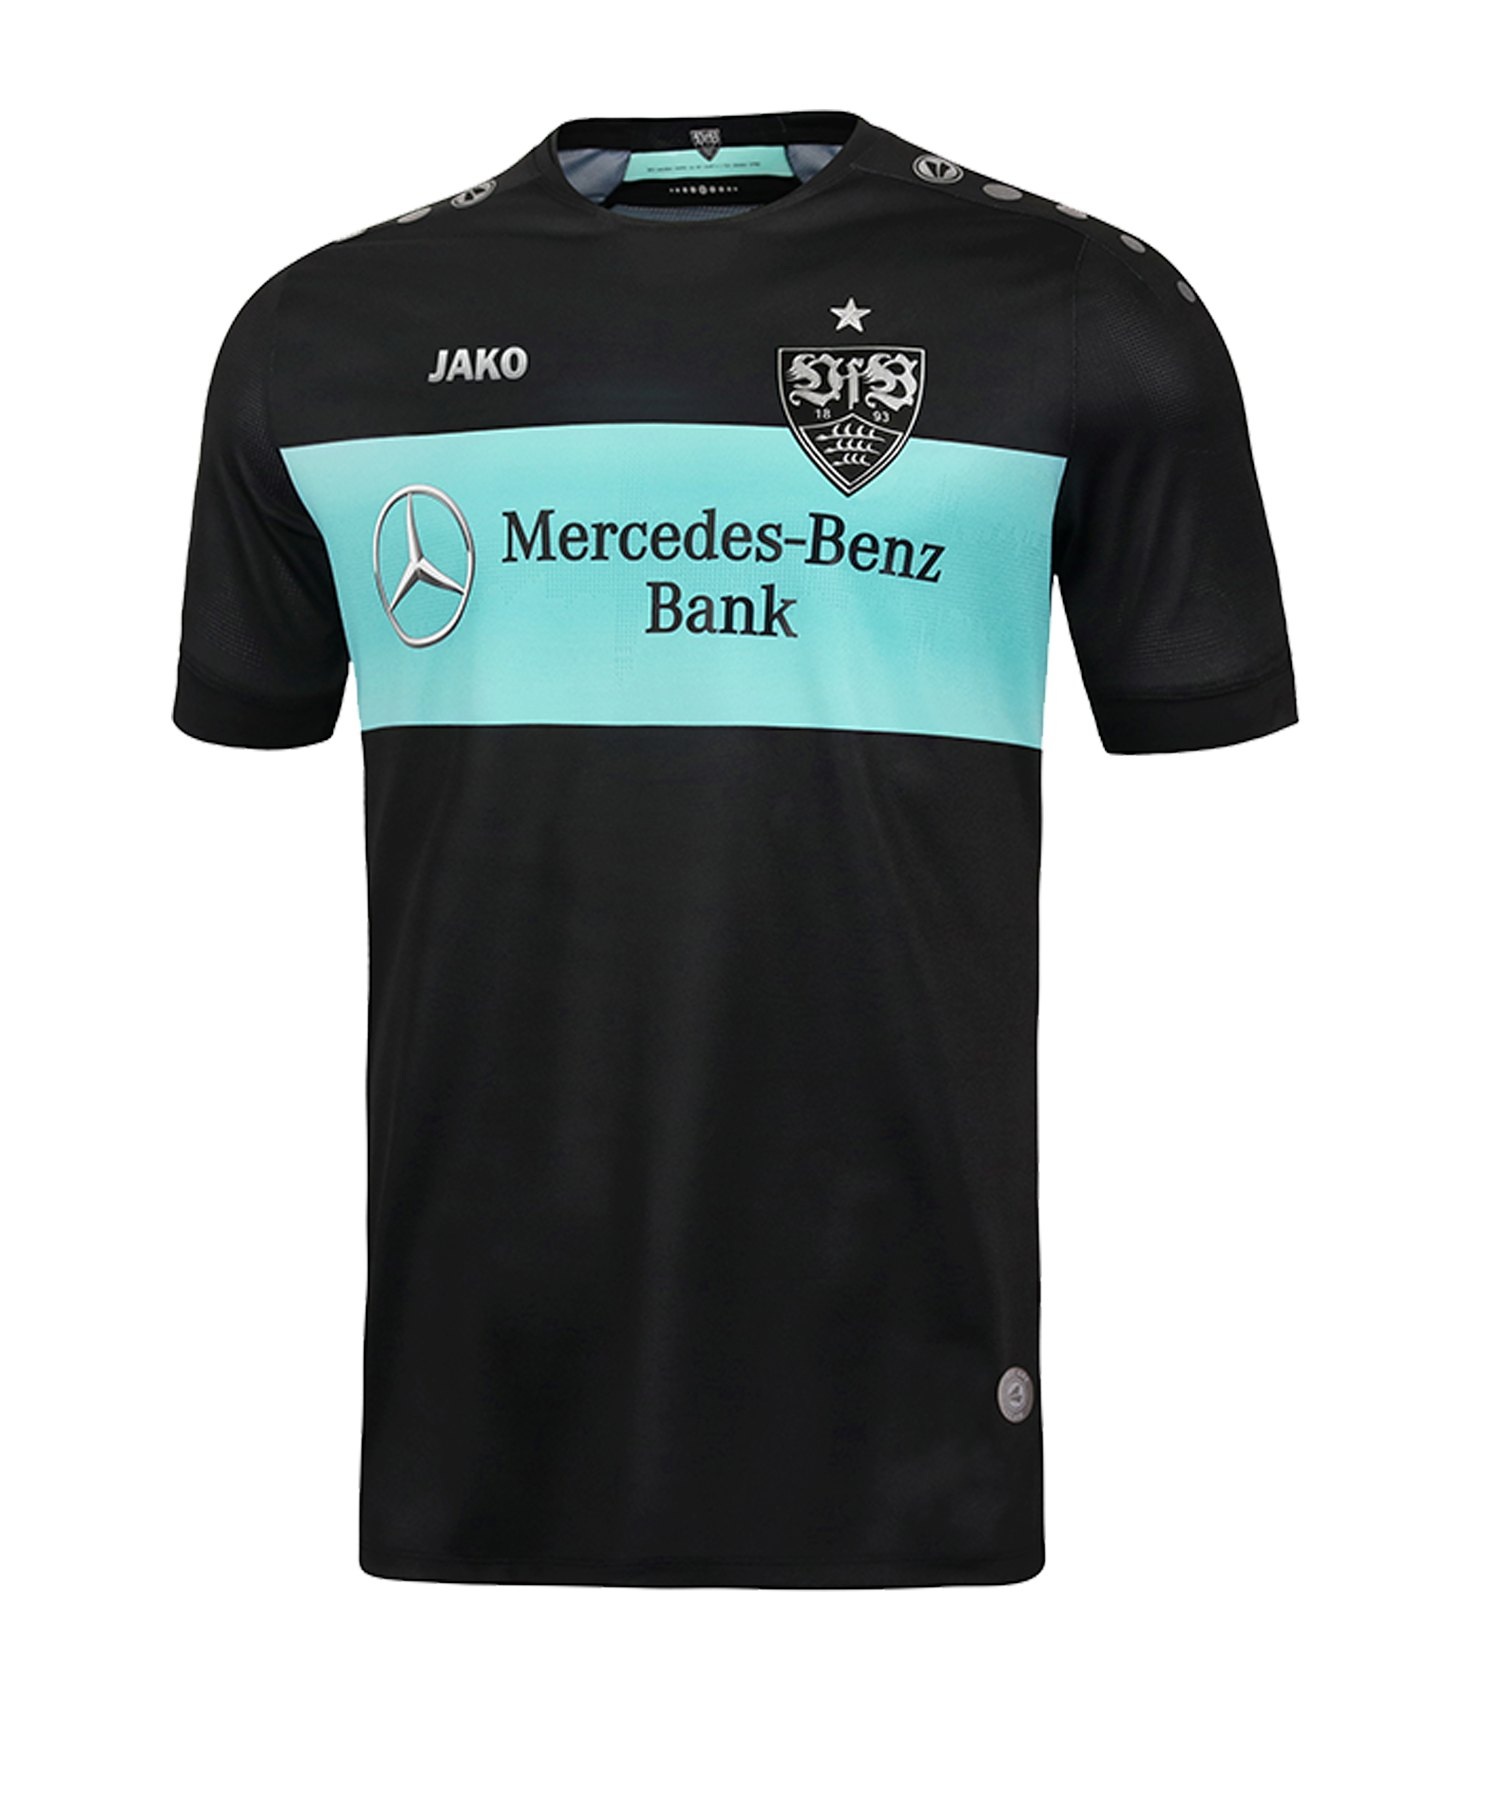 Jako VfB Stuttgart TW-Trikot Home 2019/2020 Kids Schwarz Mint F08 - schwarz